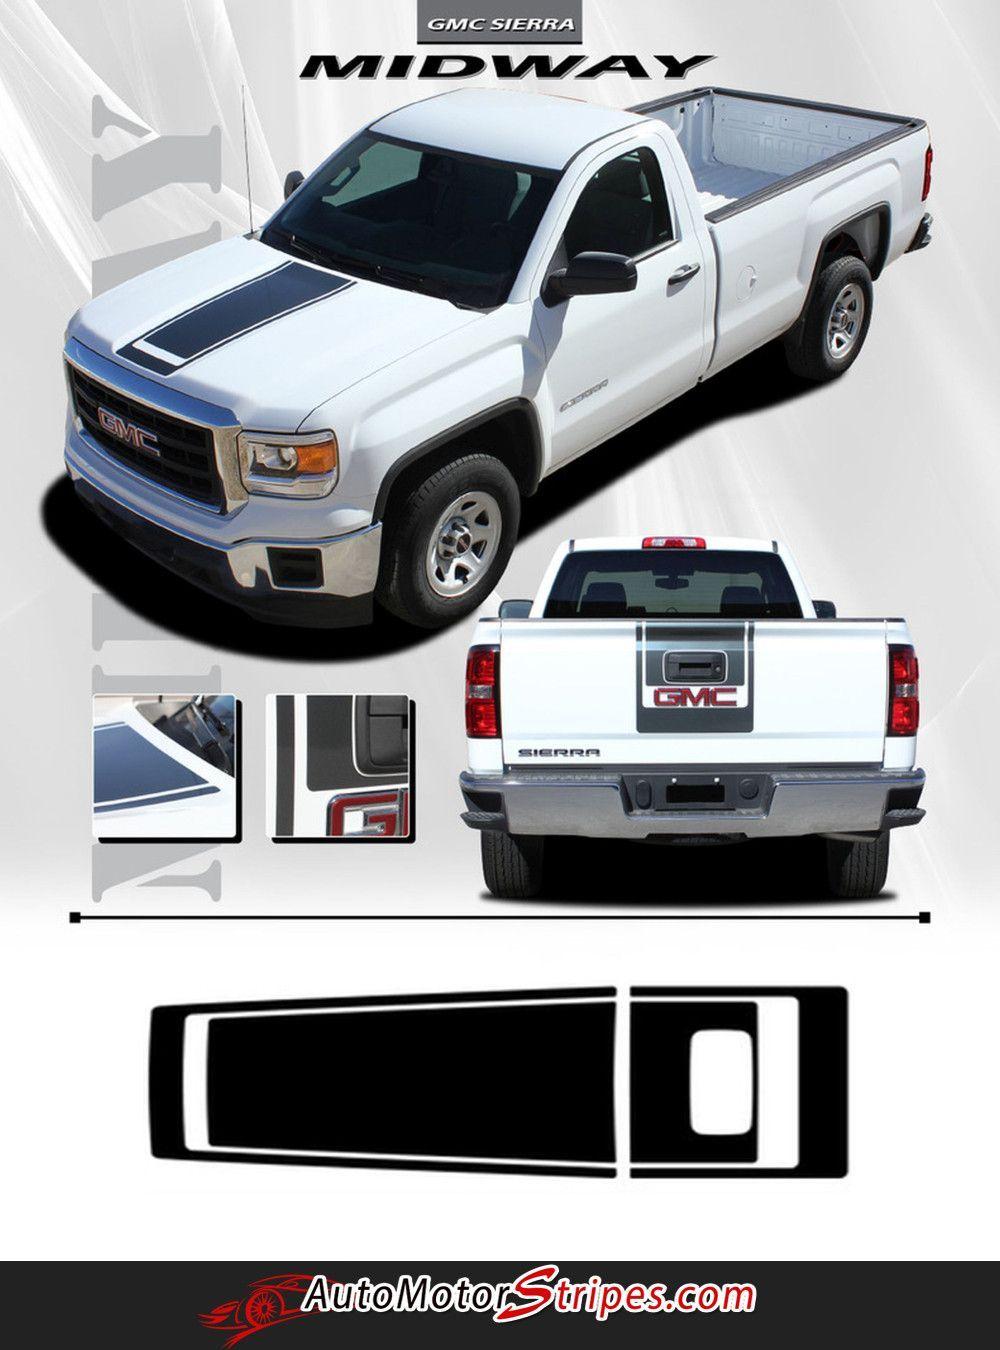 2014 2017 gmc sierra midway edition style truck center hood racing vinyl graphics 3m stripes kit